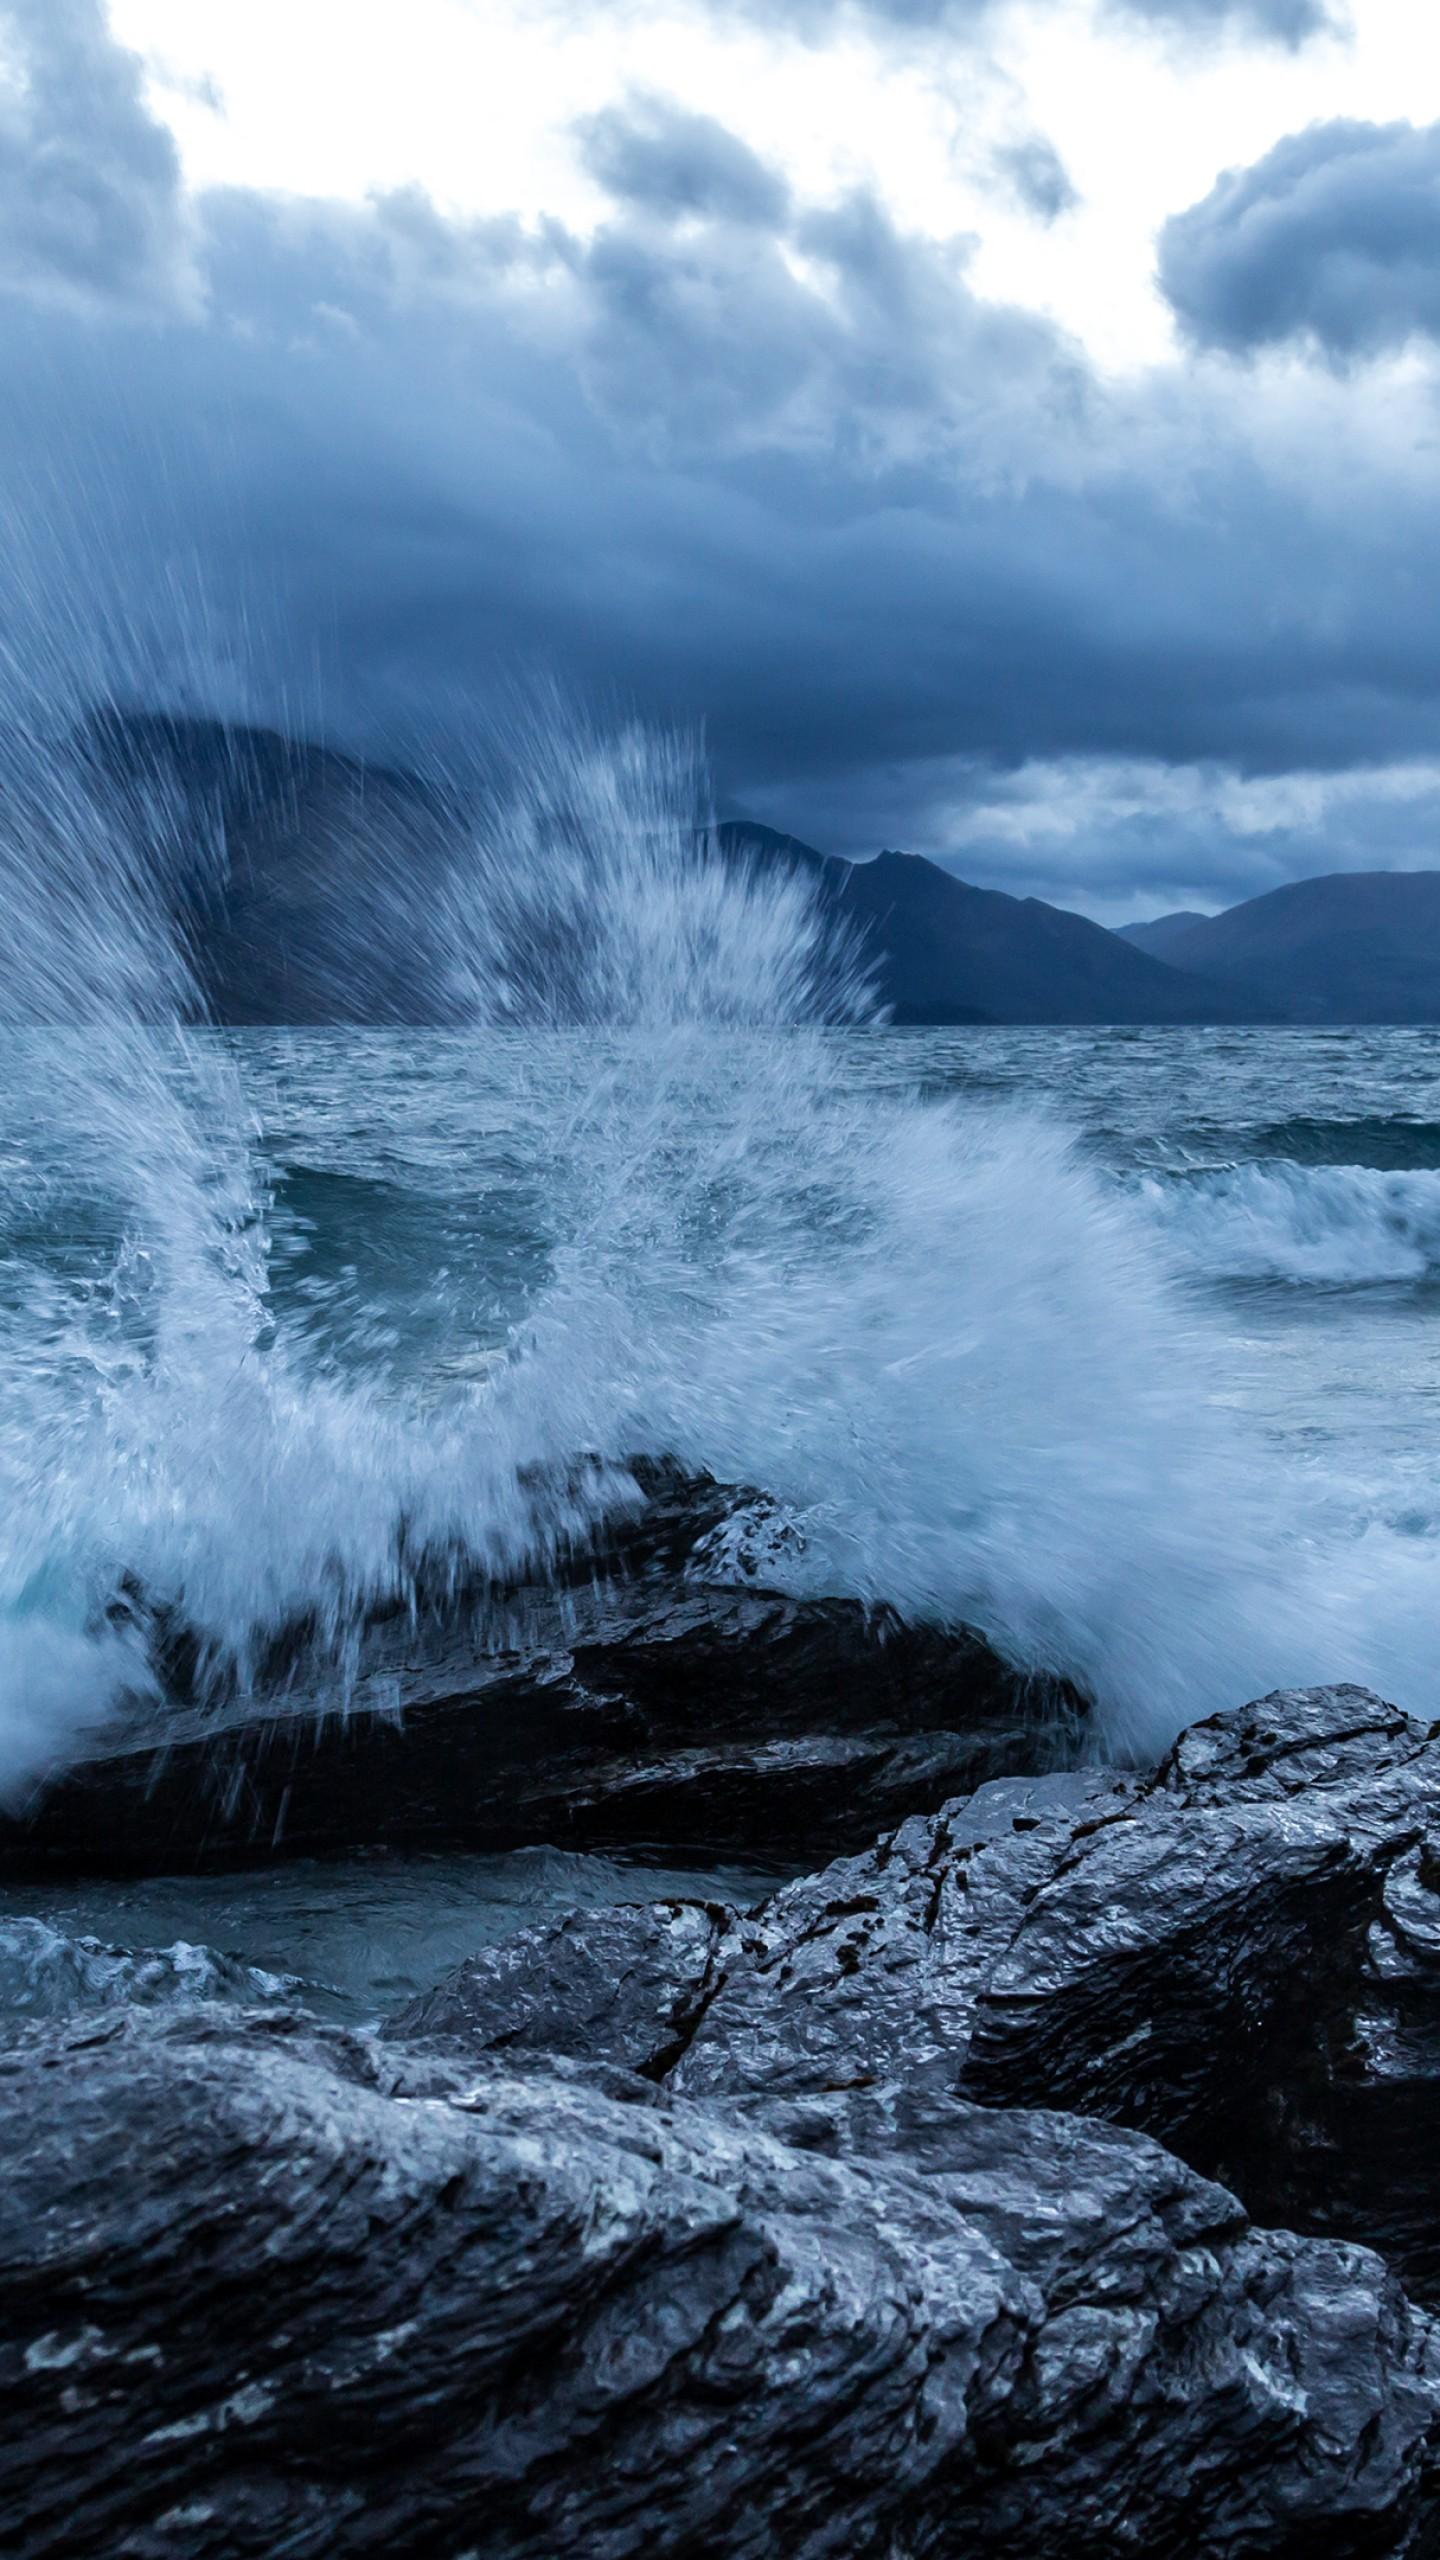 Обои отлив, лучи, тучи, скалы. Природа foto 7